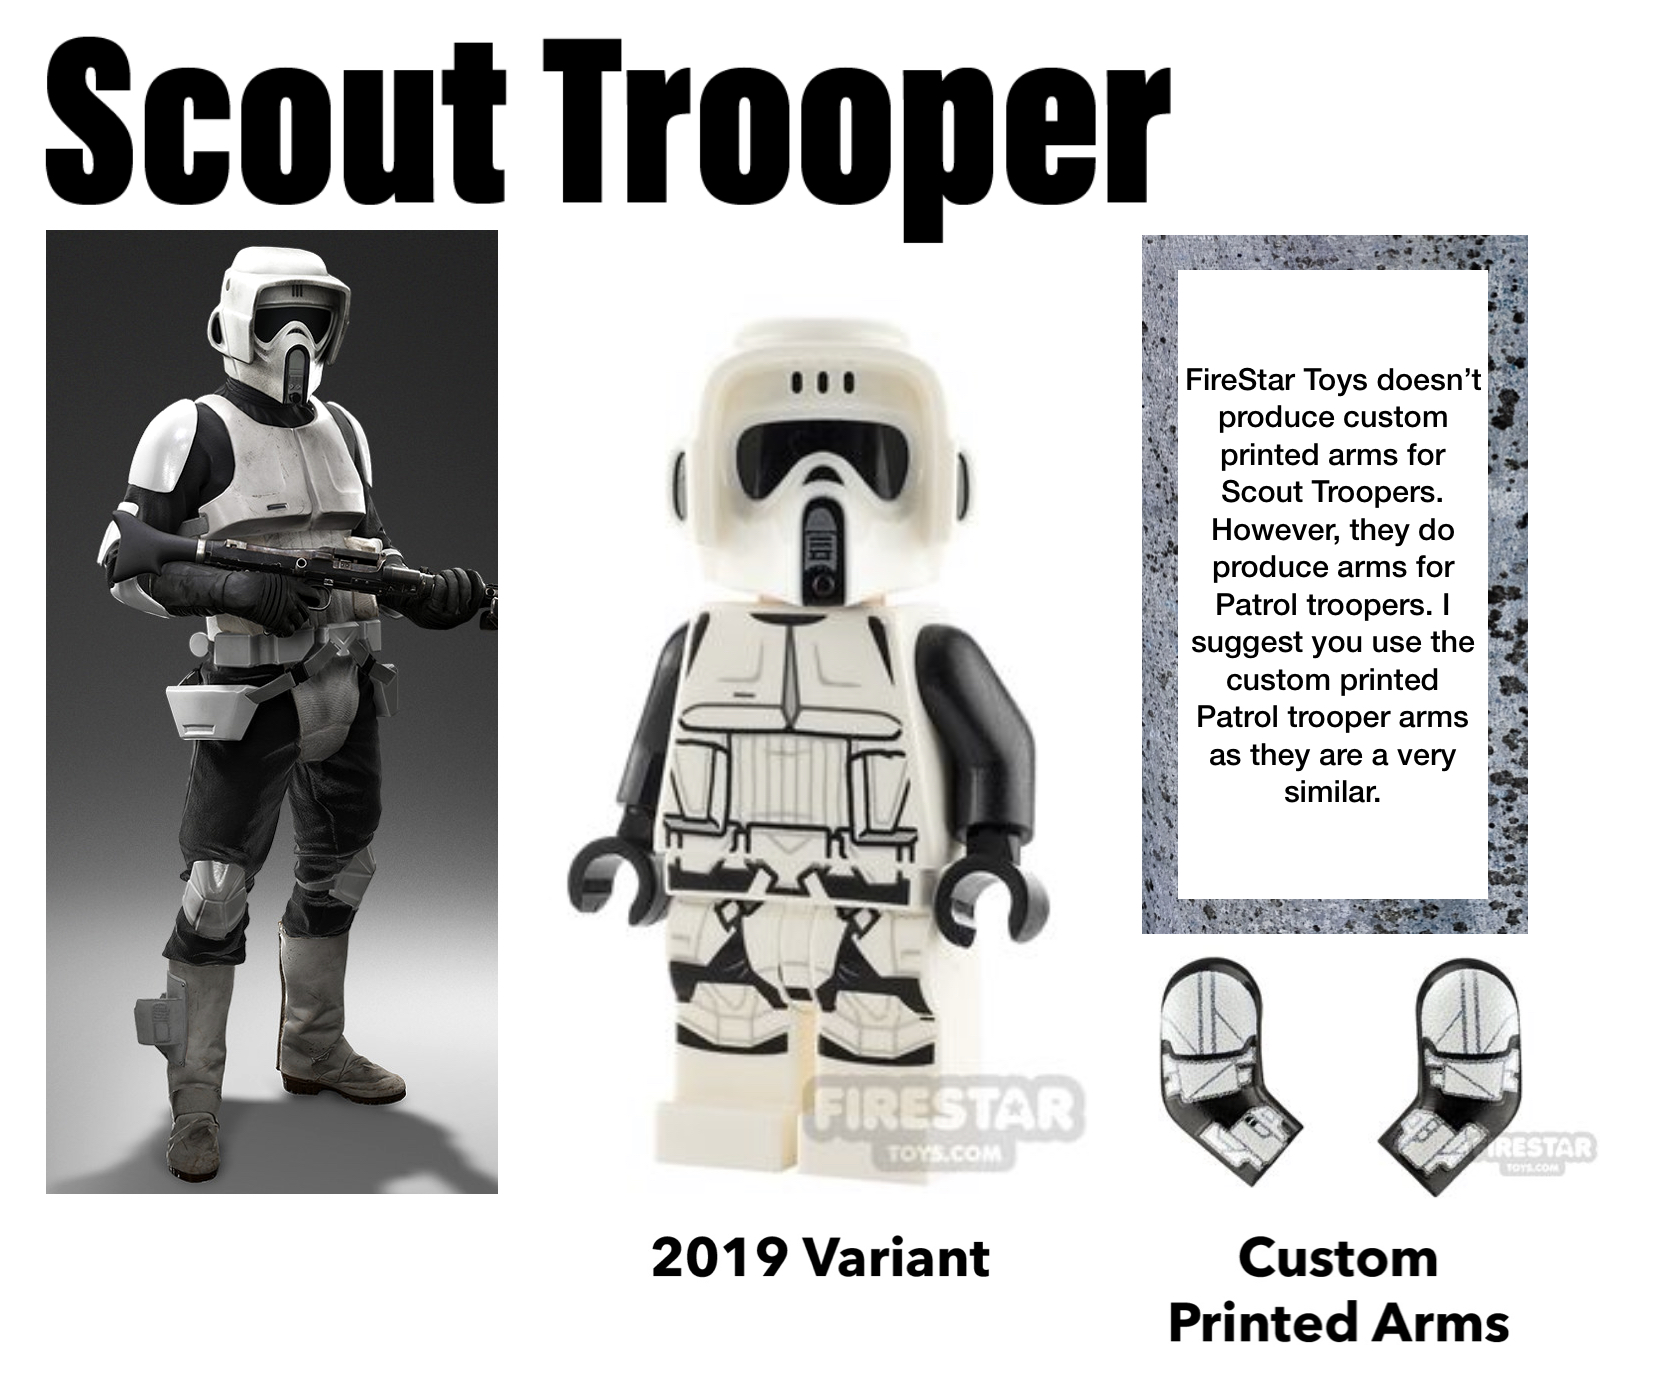 lego stormtrooper scout trooper